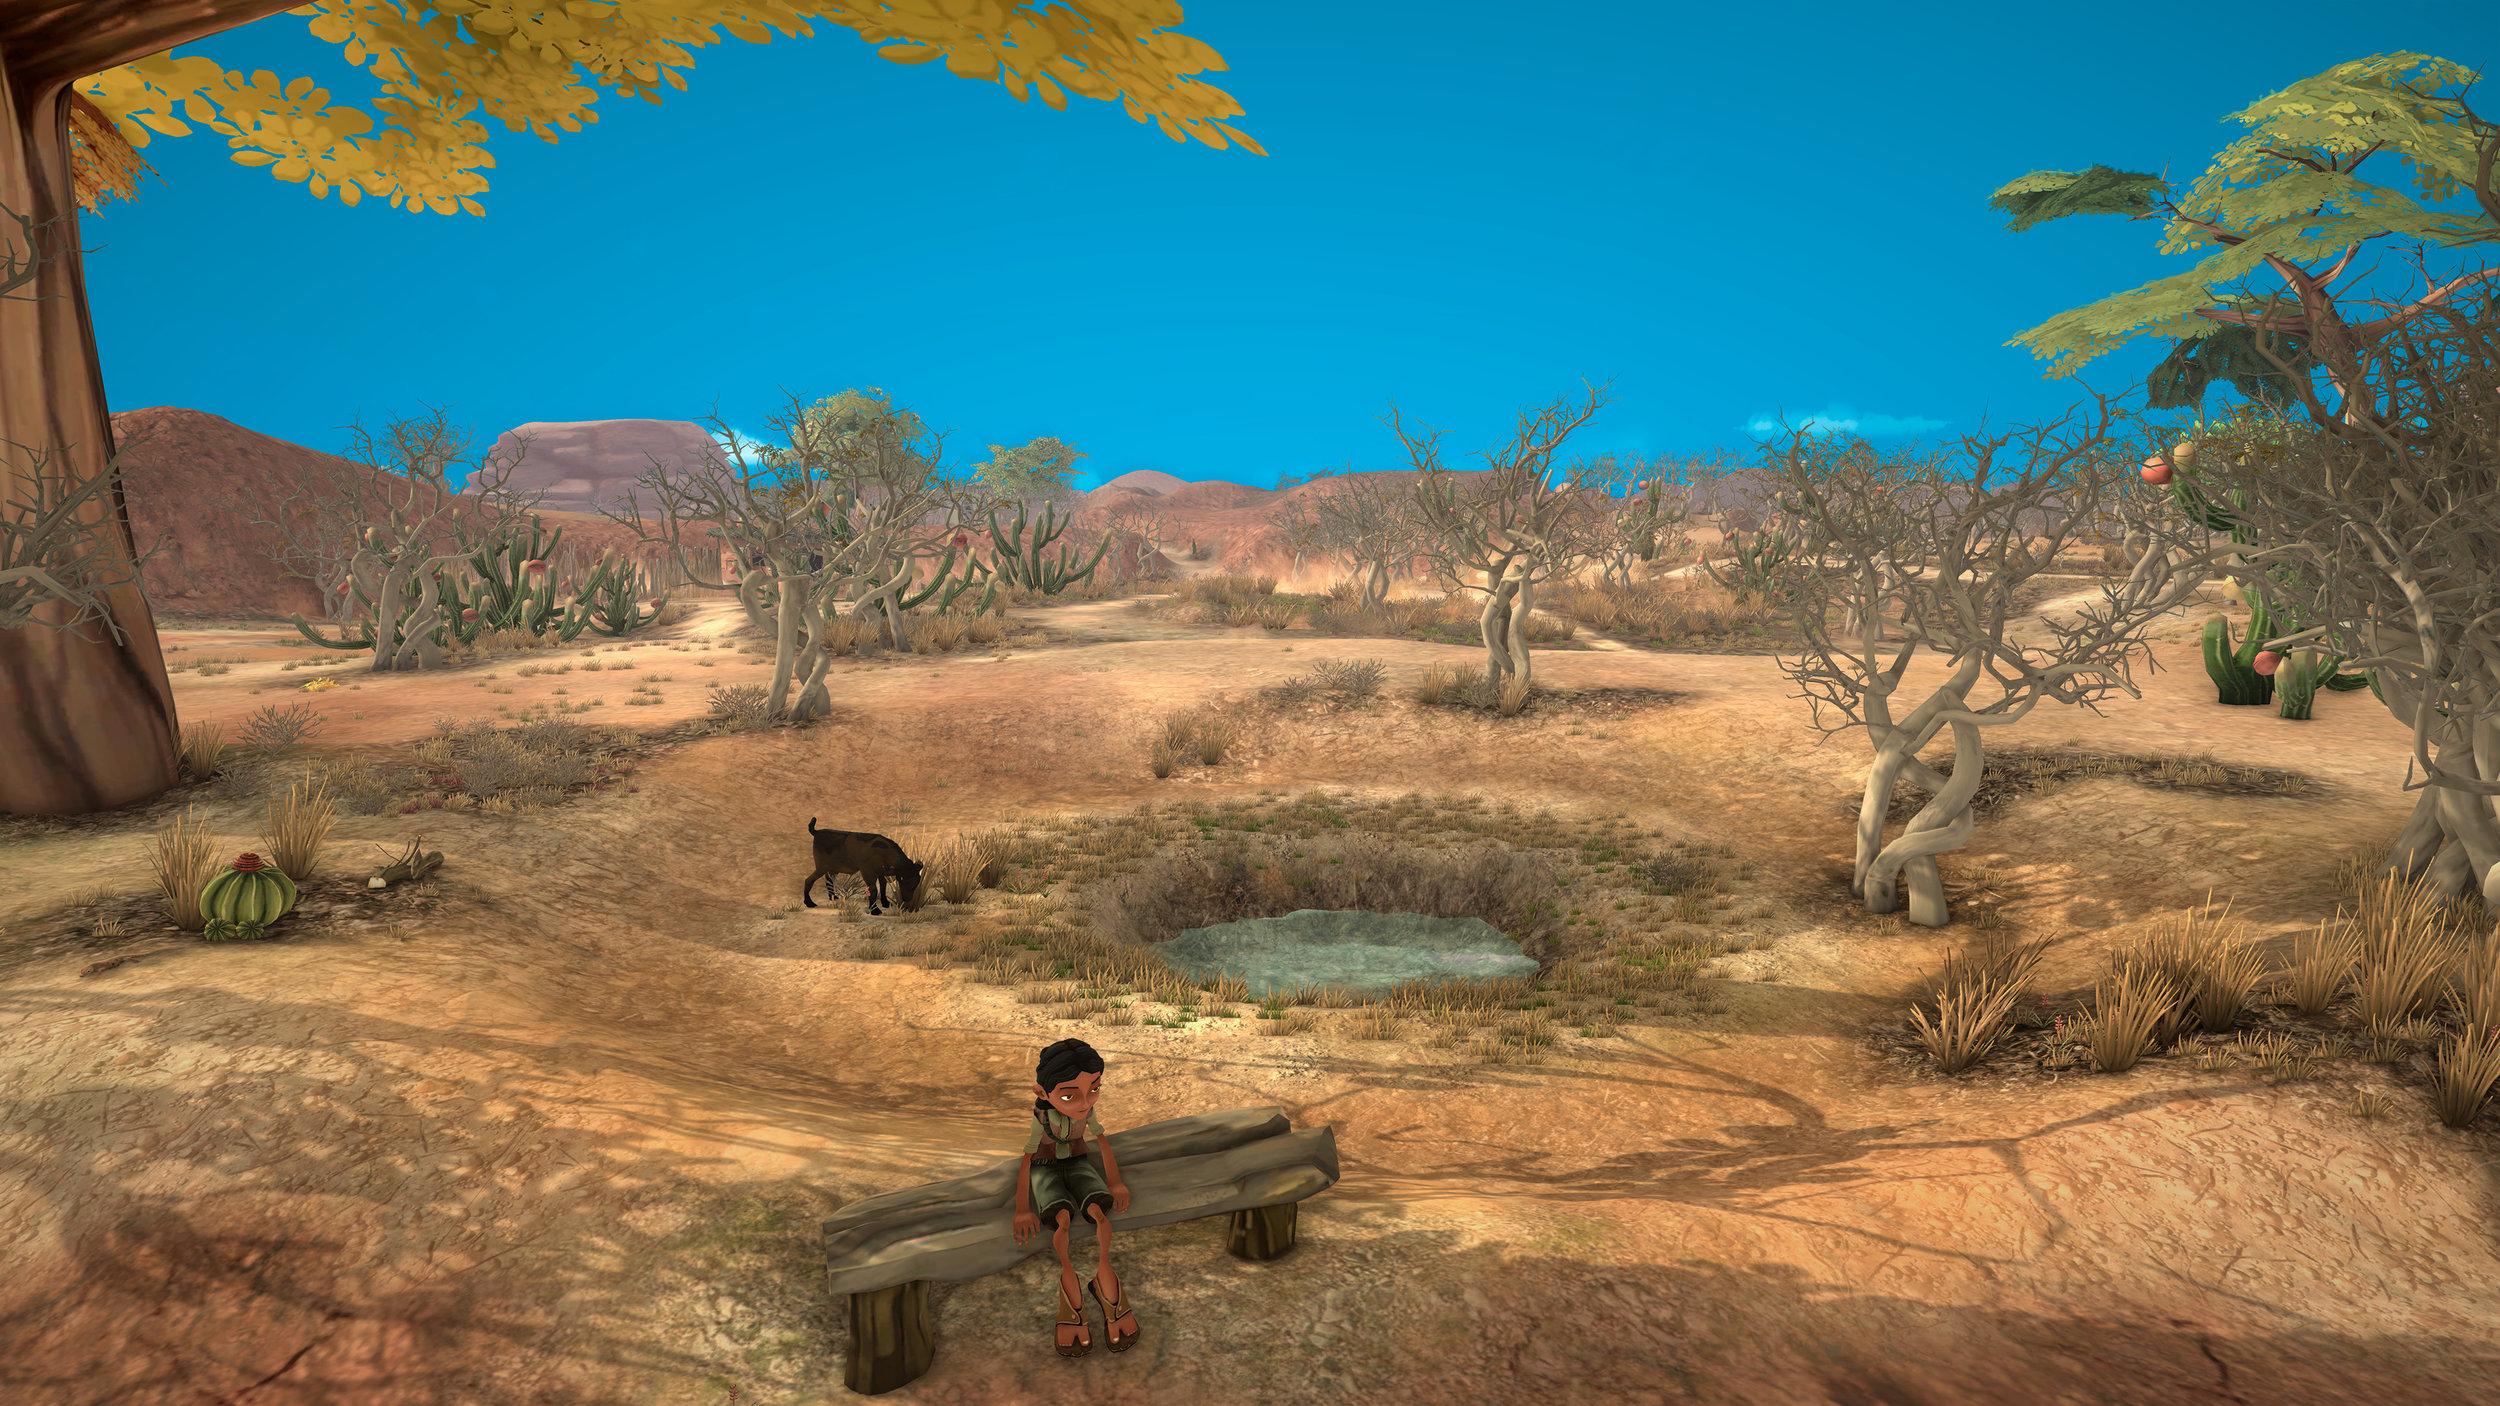 arida-screenshot-4.jpg